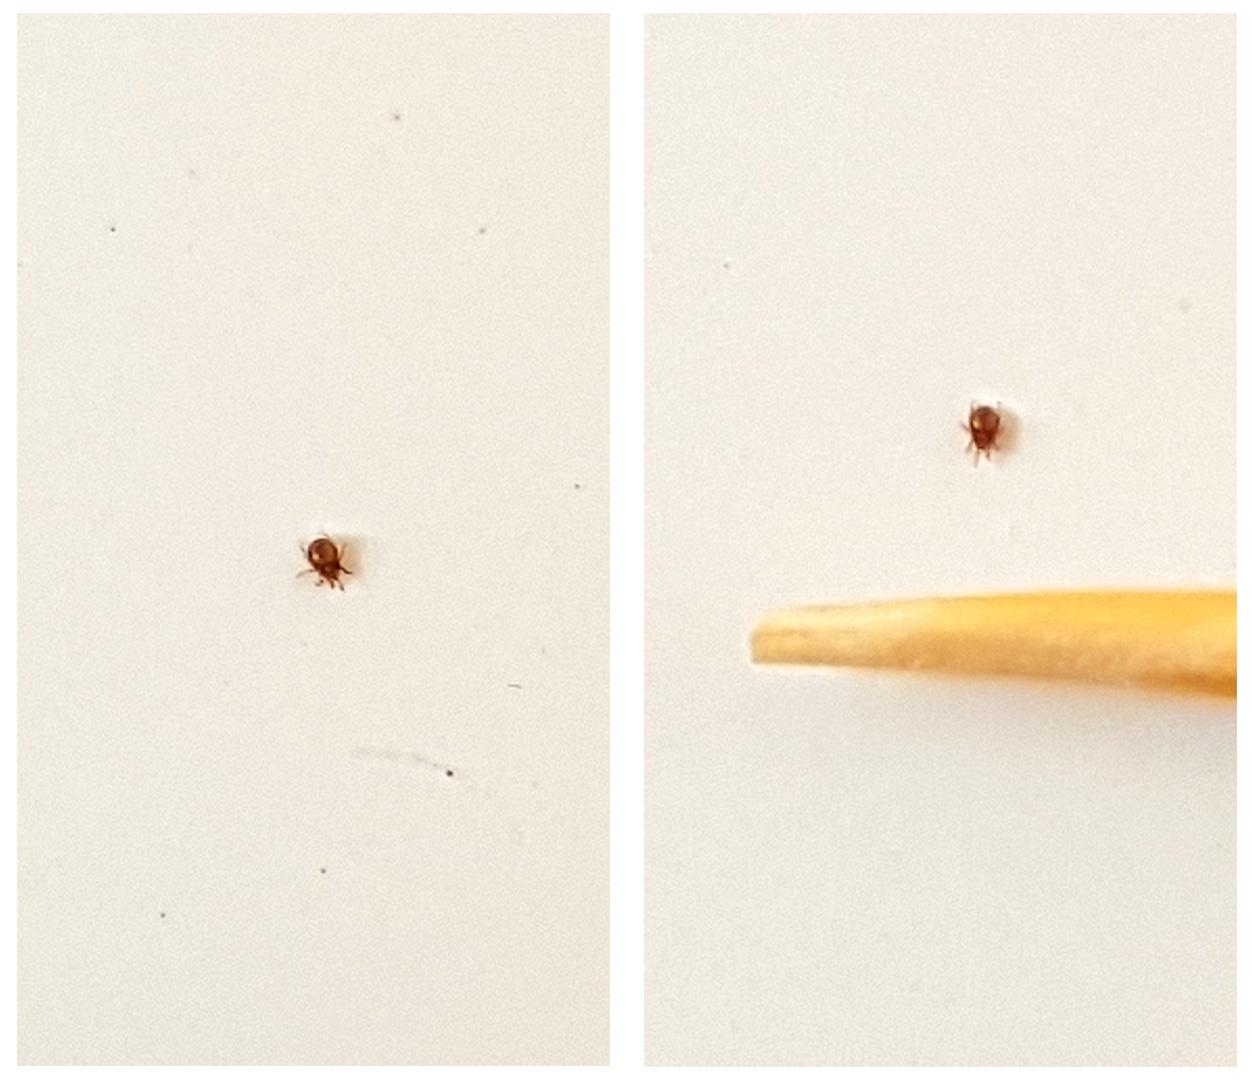 Identification minuscules bêtes noires XSed8cfdTDm3SSOFpaldegsqgAdvZn